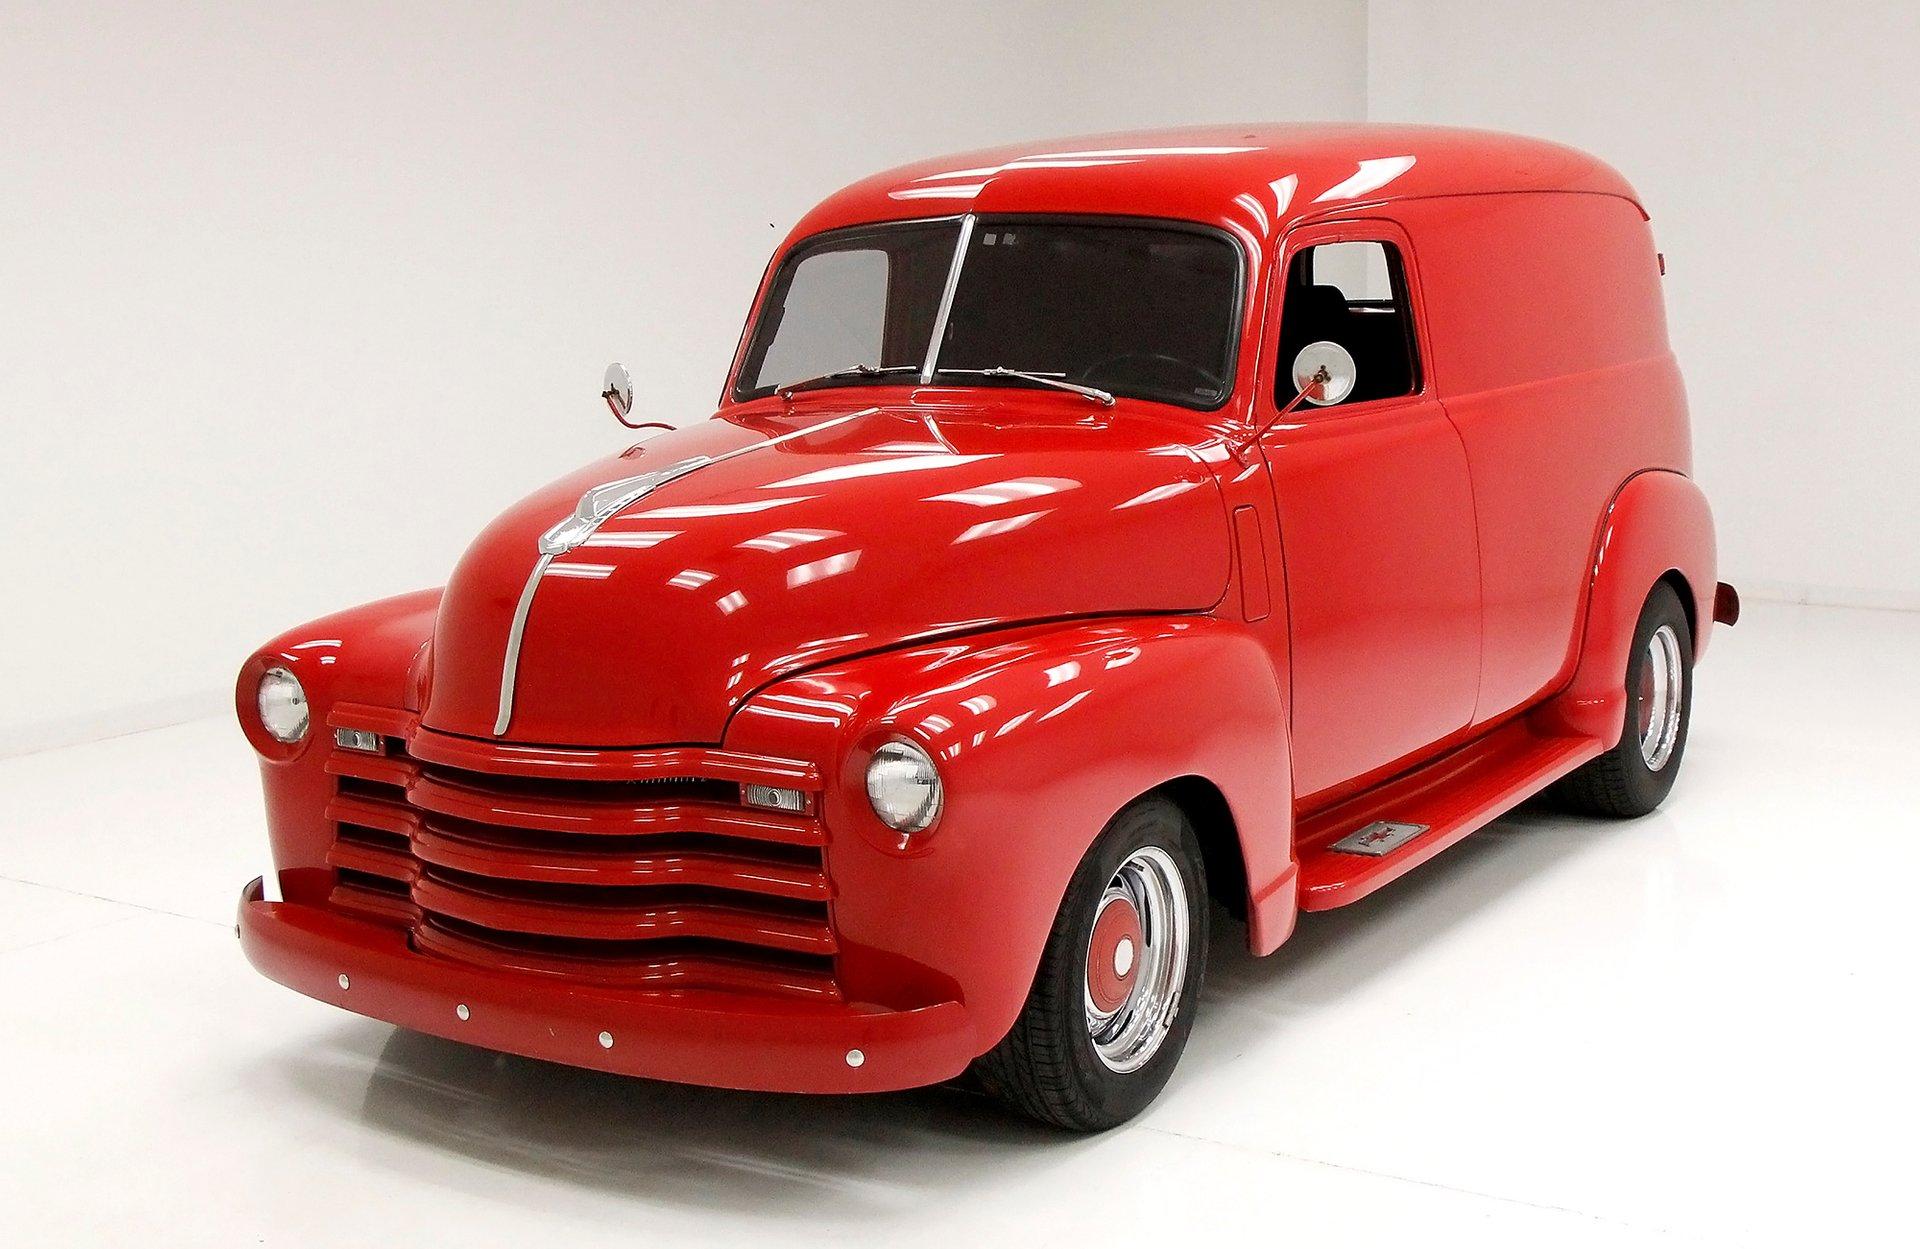 1947 Chevrolet 3100 Sedan Delivery